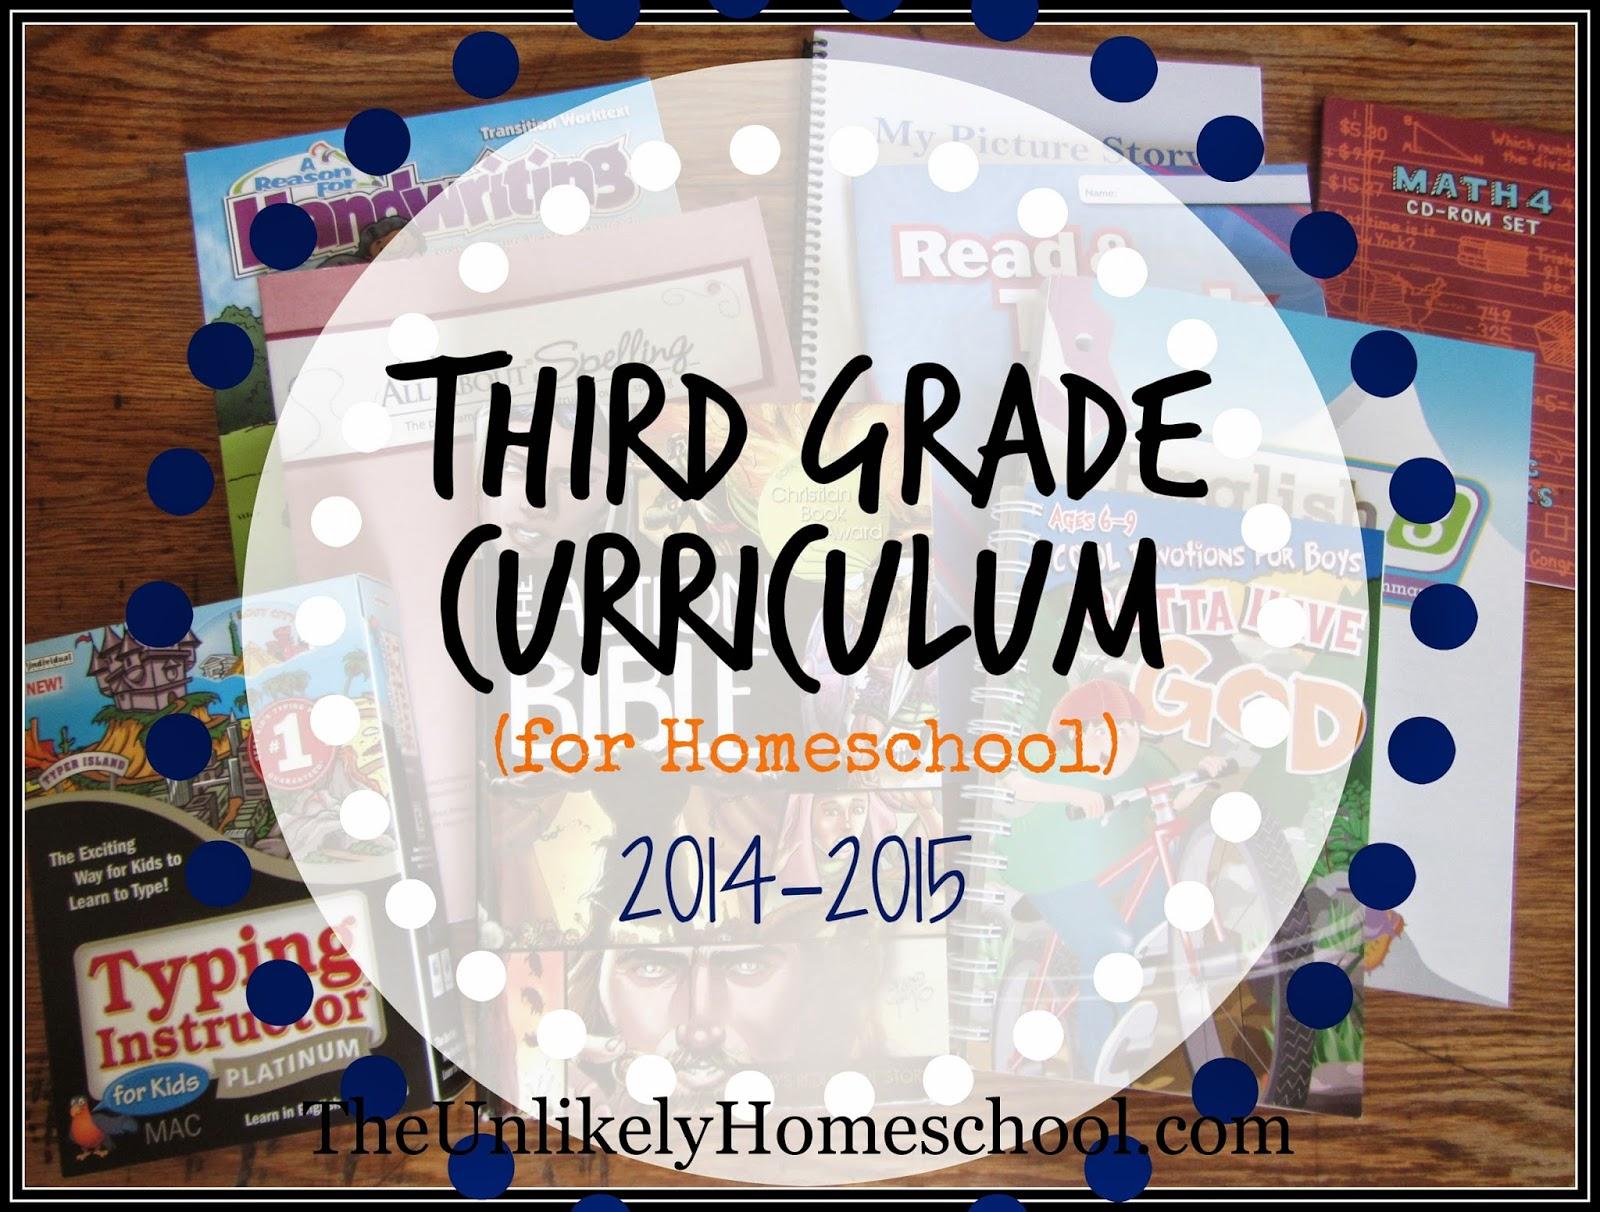 Third grade curriculum for homeschool the unlikely also theunlikelyhomeschool com